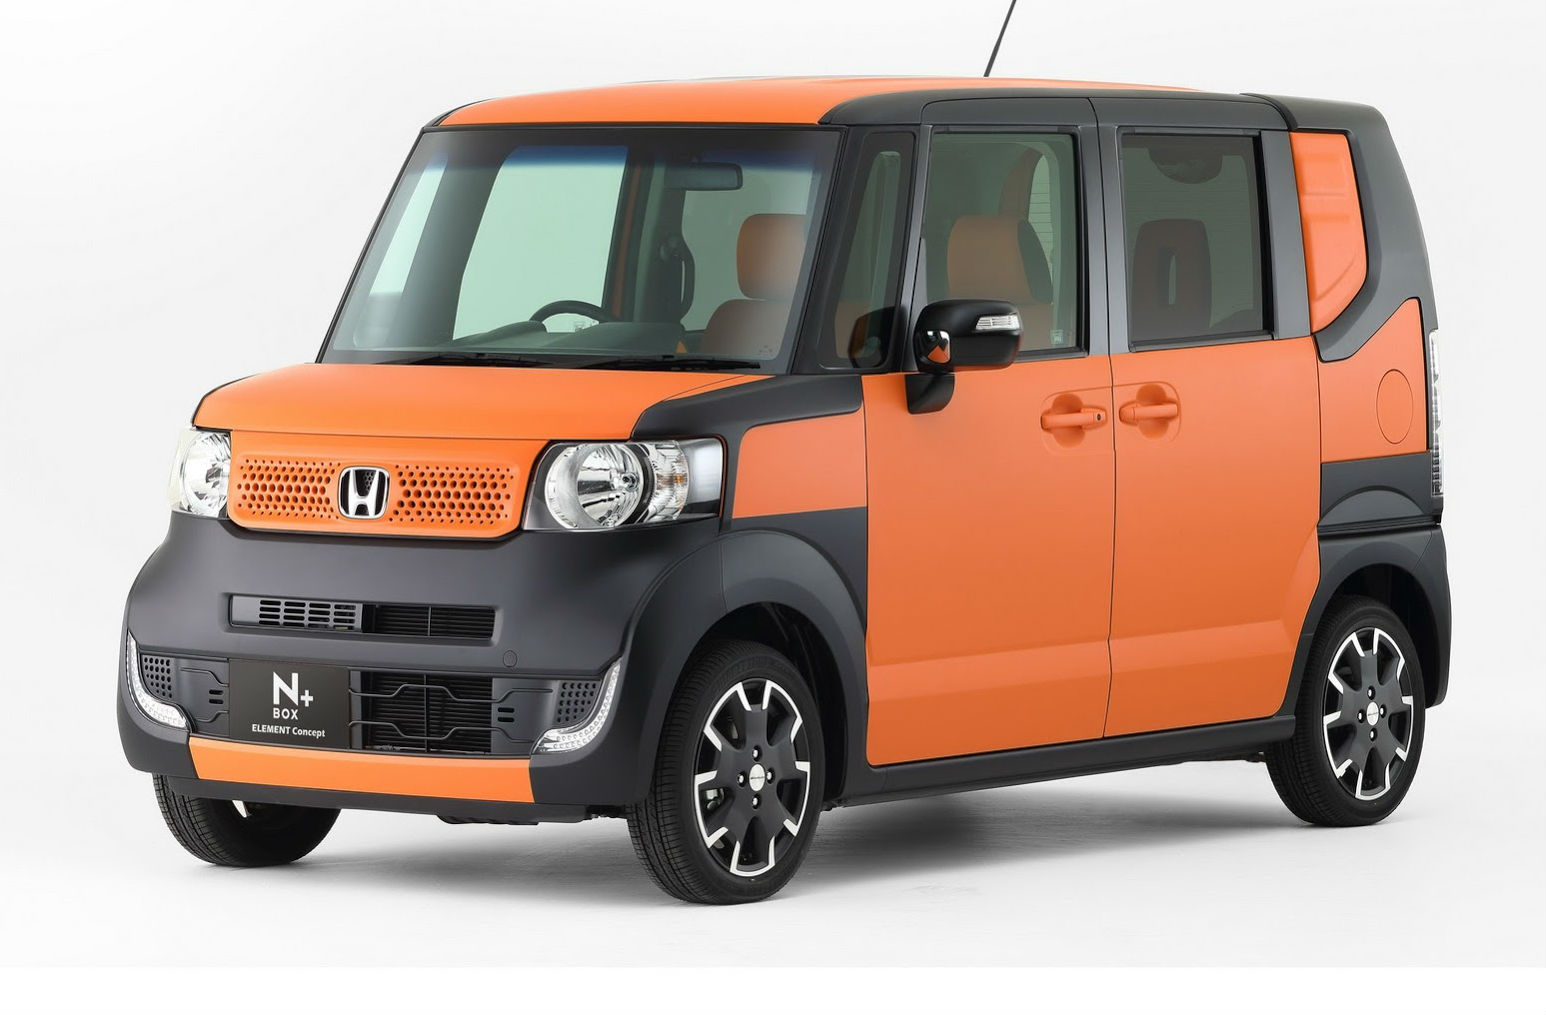 2014 Tokyo Auto Salon: Honda, Mazda Concepts Revealed